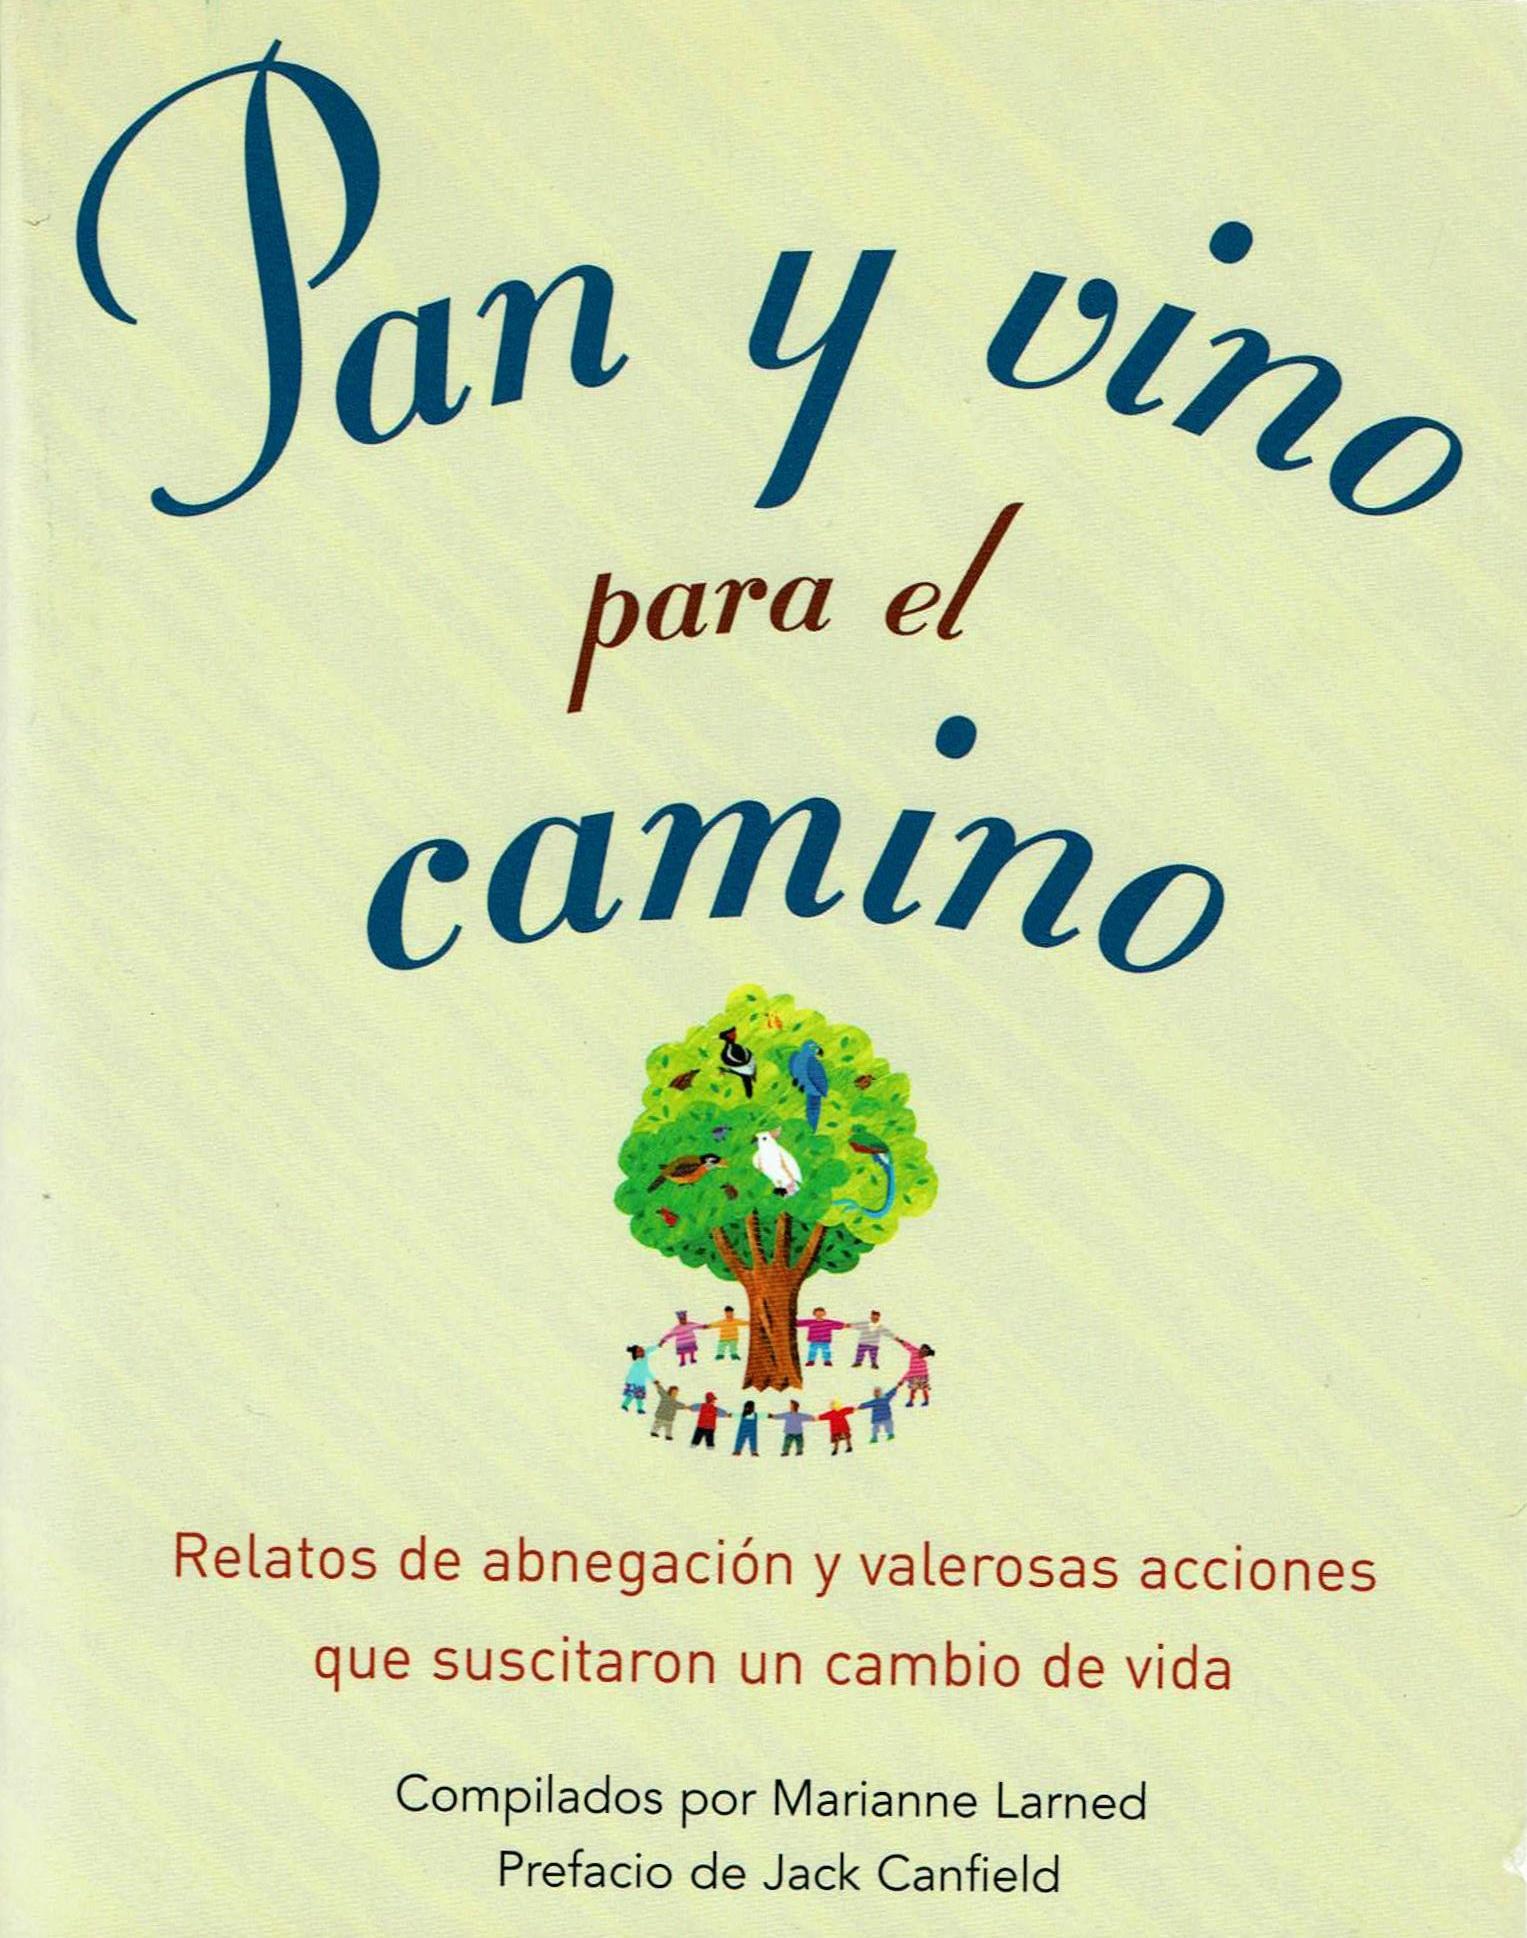 pan-y-vino-book-cover